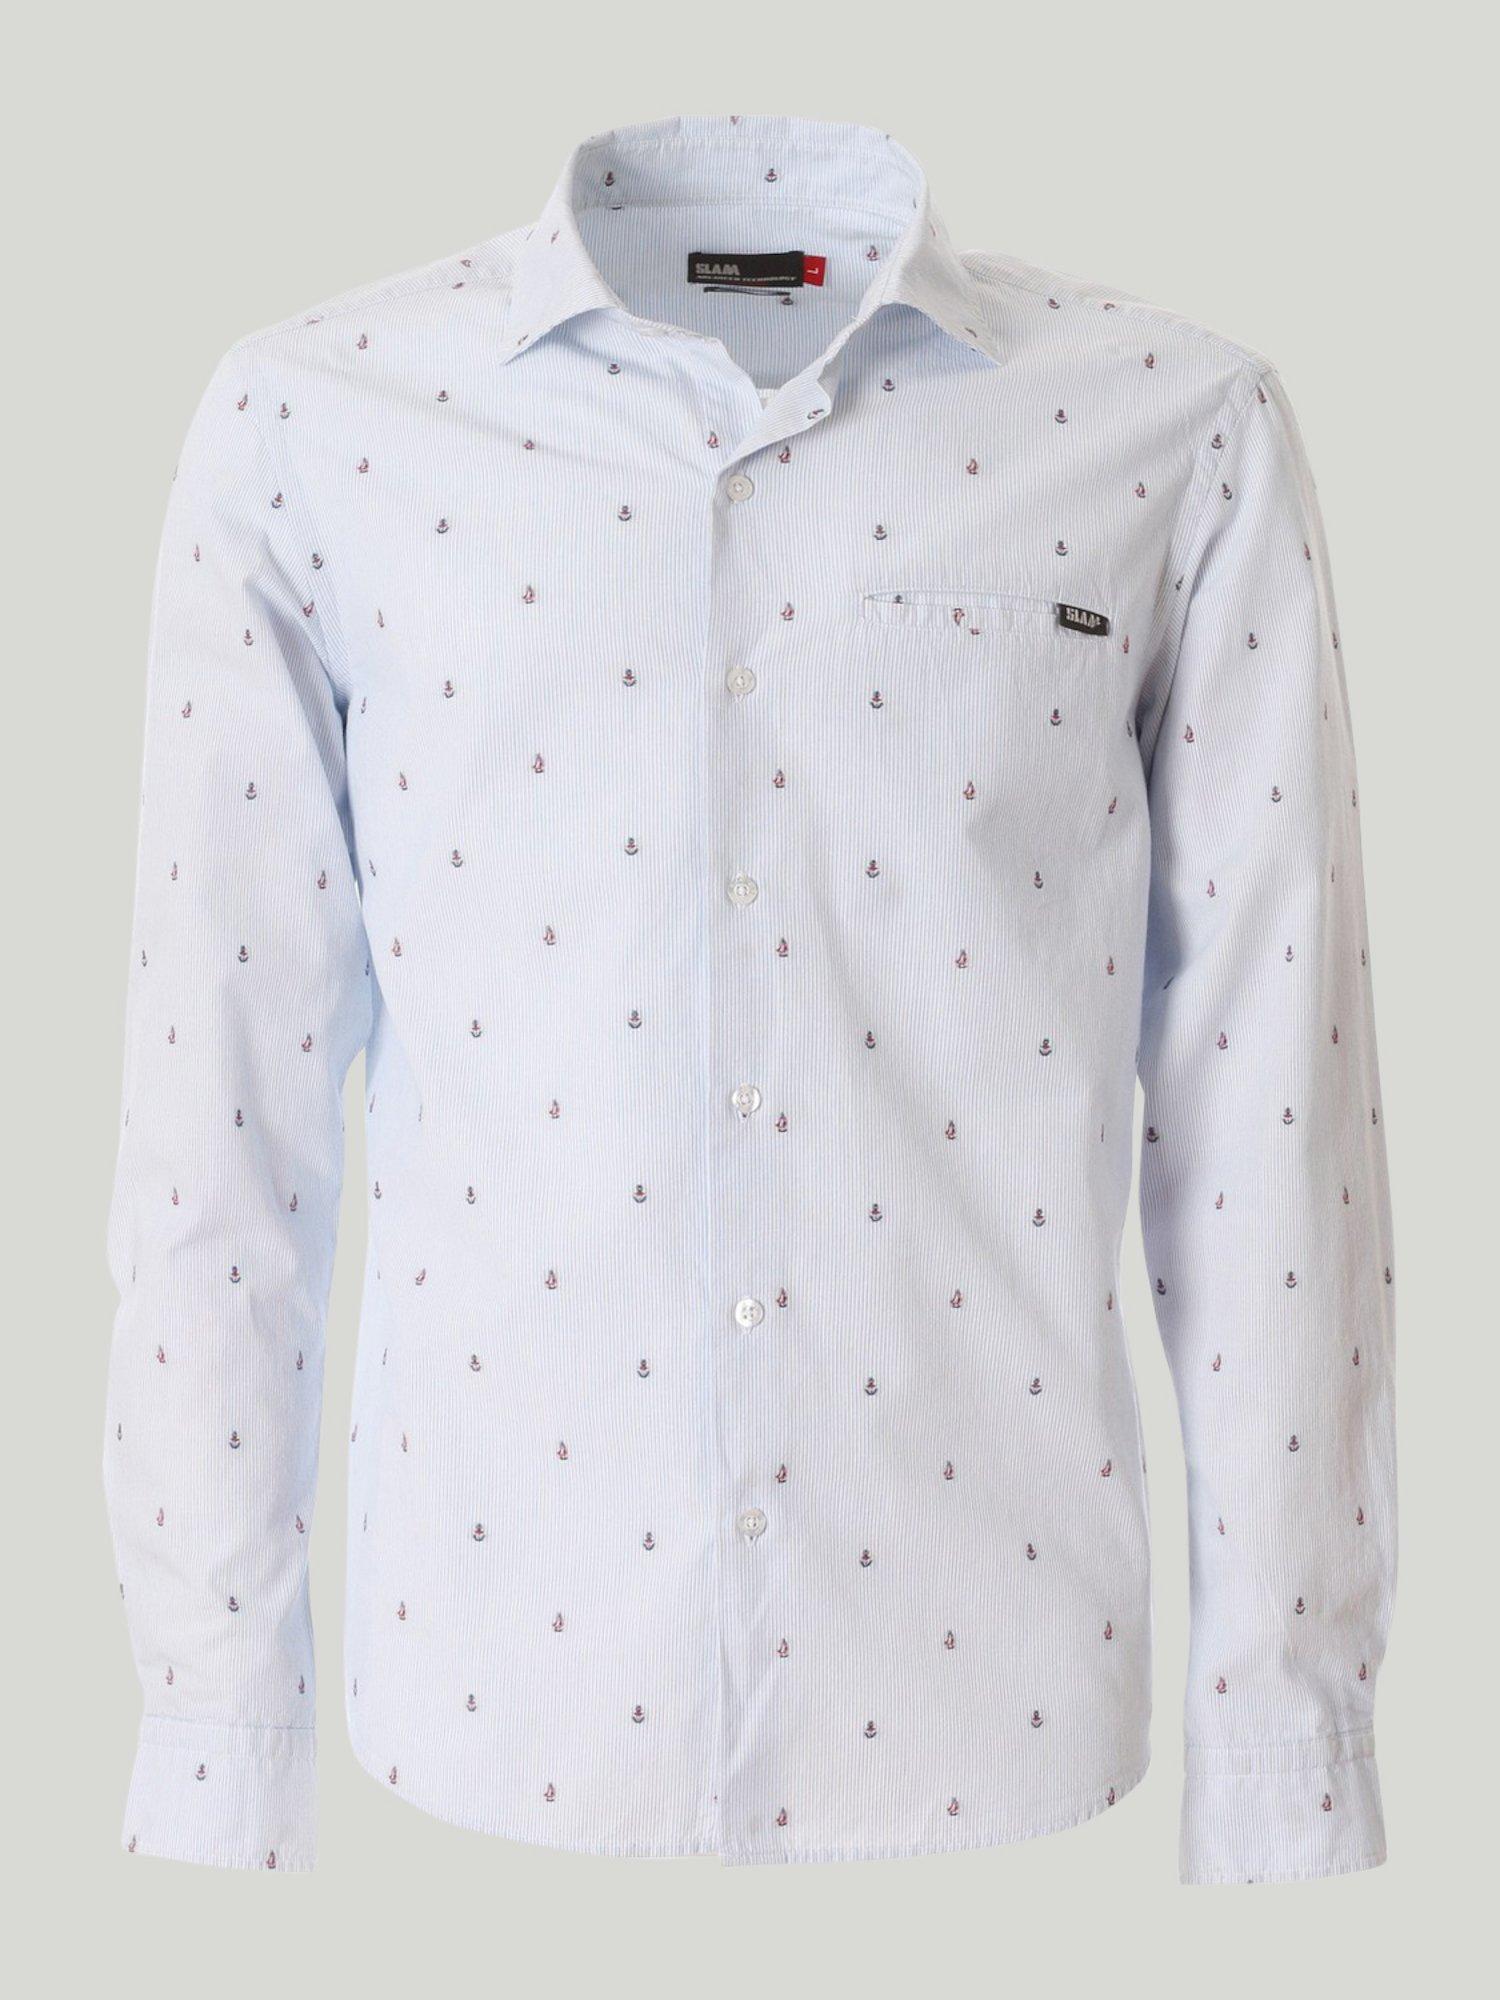 Eretria shirt - Striped White / Light Blue